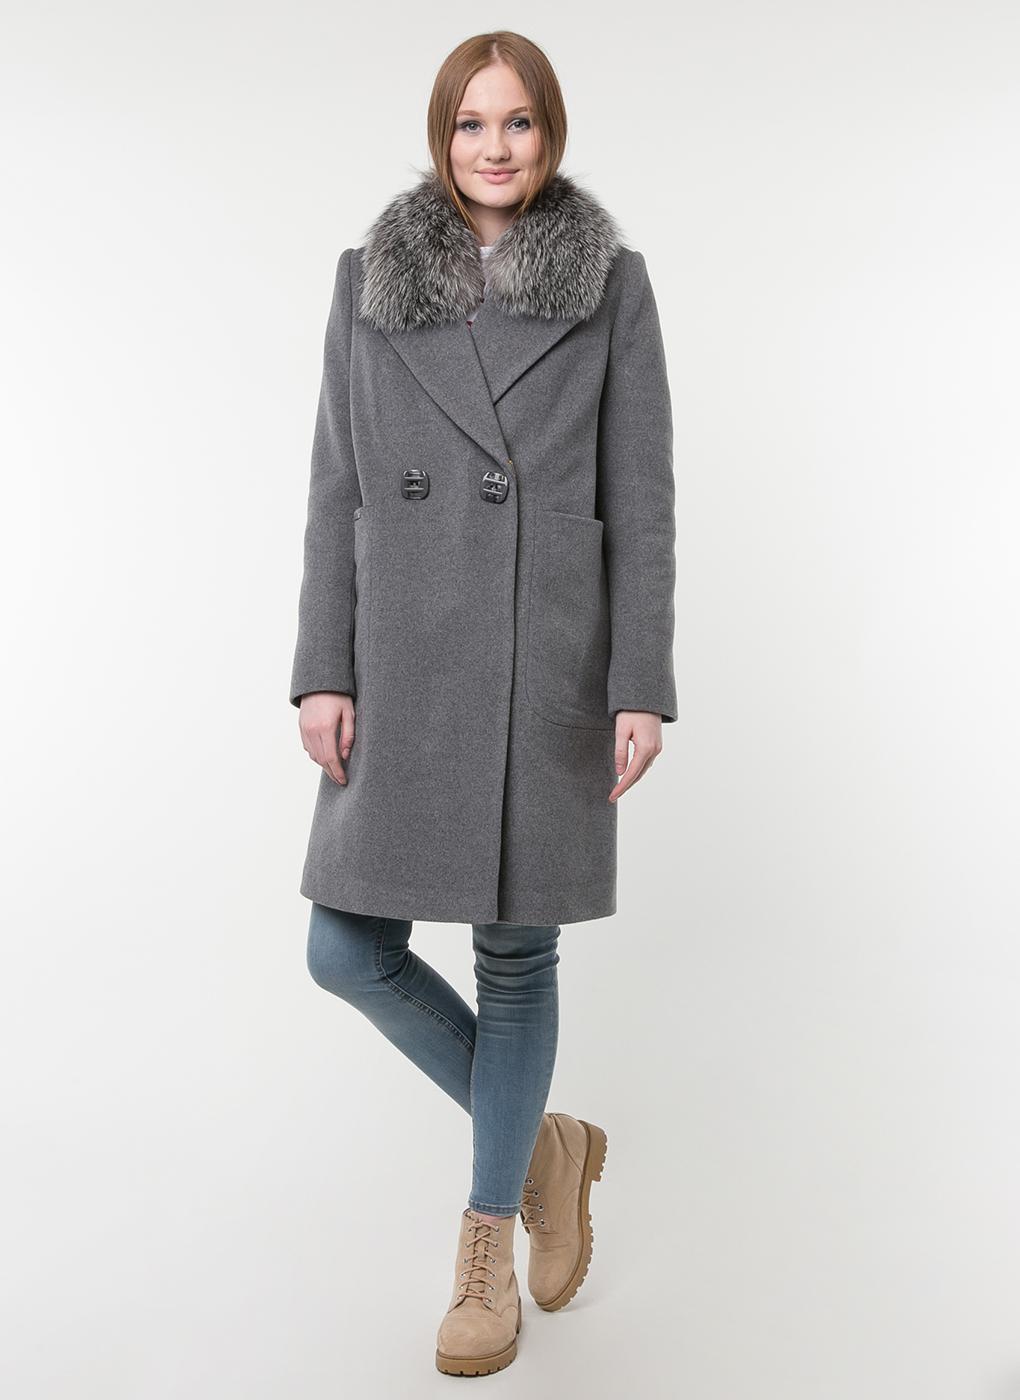 Пальто прямое шерстяное 50, idekka фото